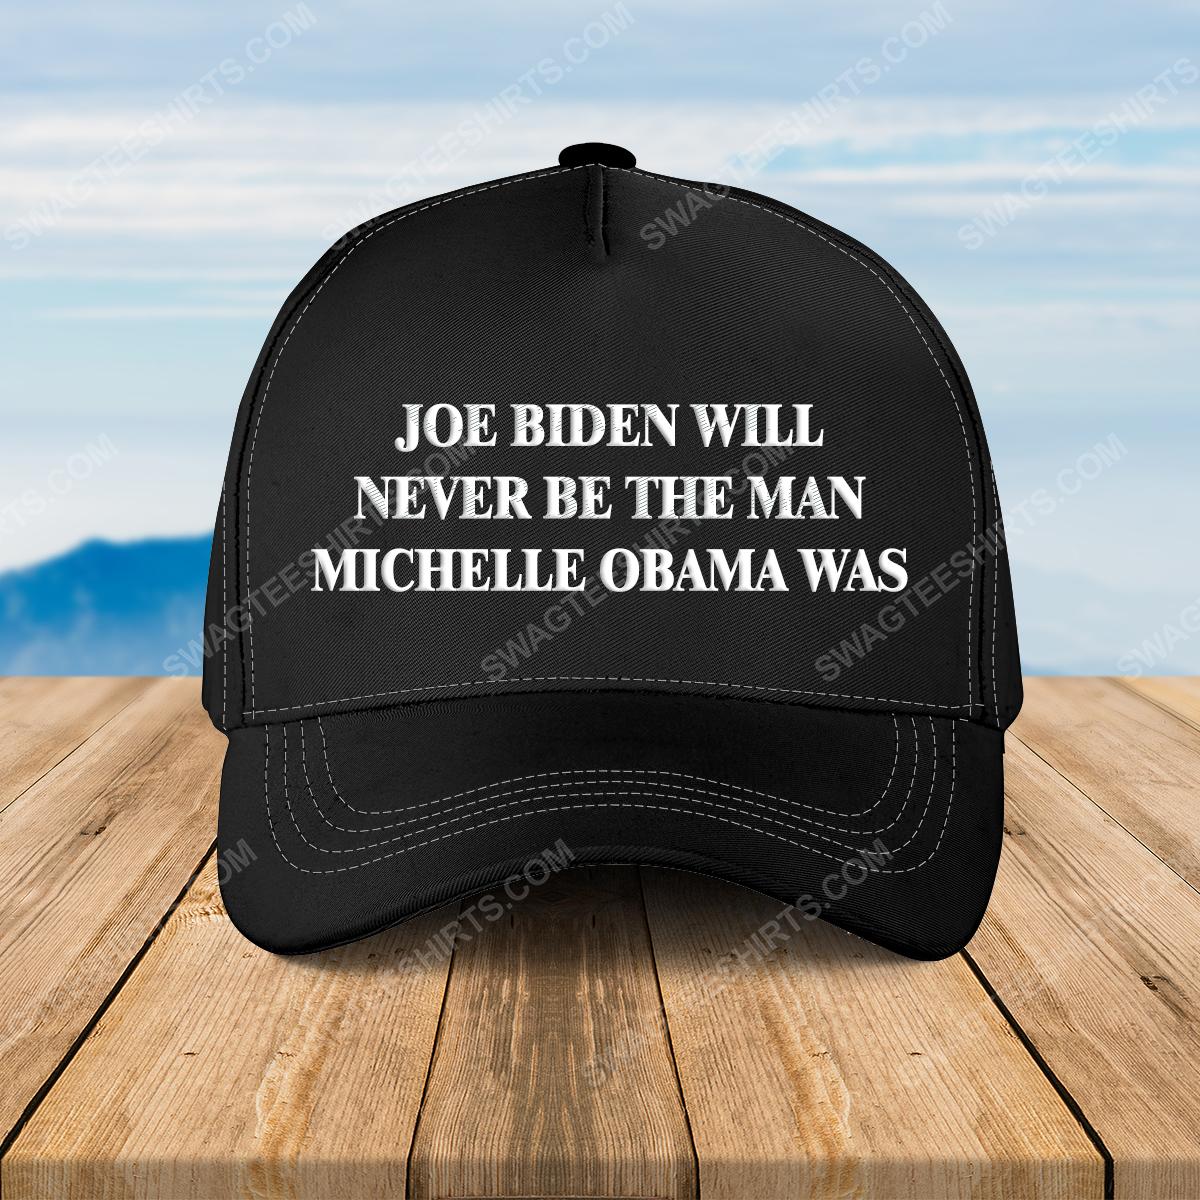 Joe biden will never be the man michelle obama was full print classic hat 1 - Copy (2)